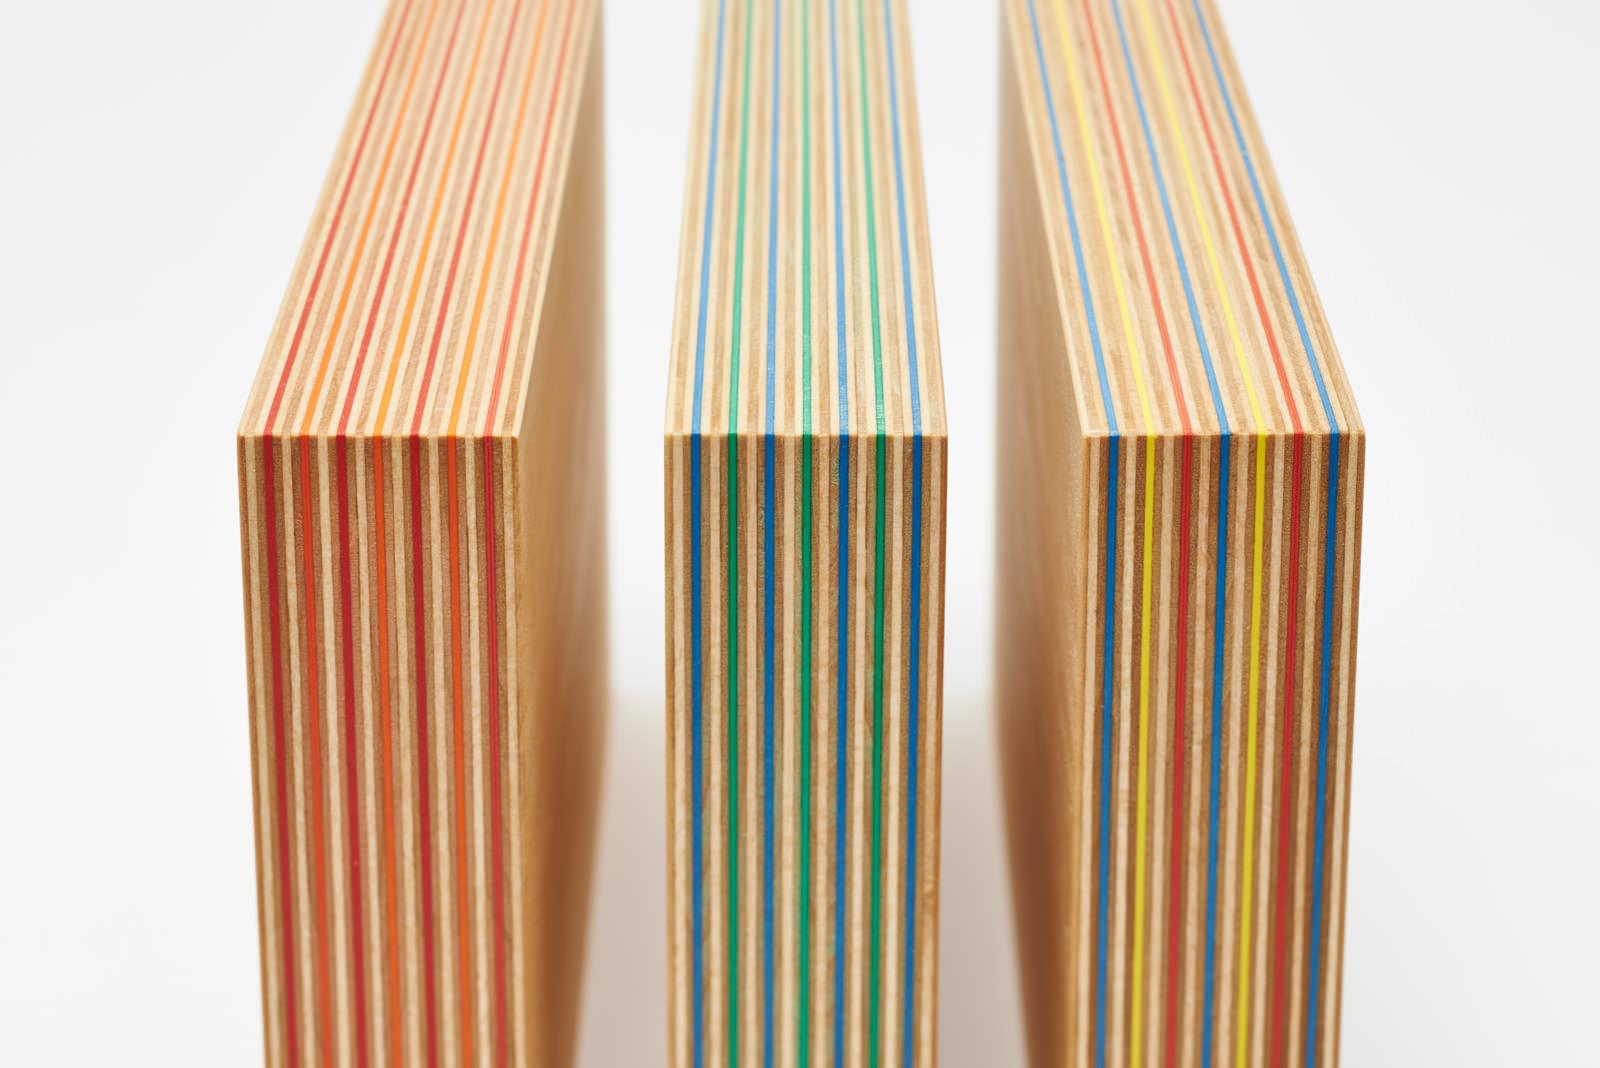 Takizawa Plywood Veneer Paper Wood With Integrated